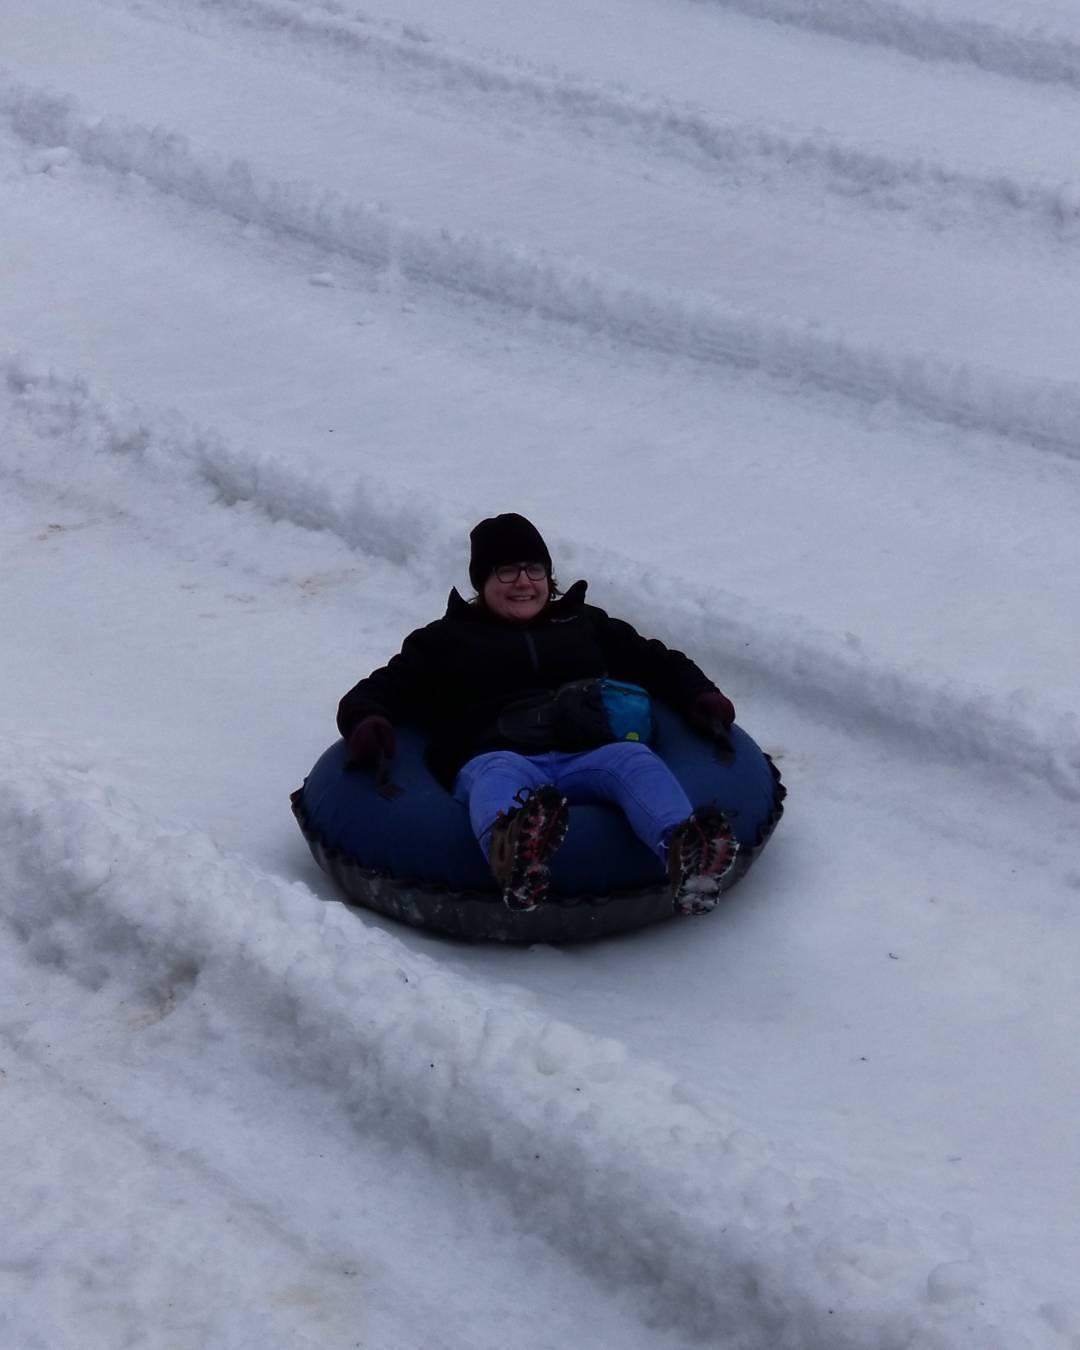 Things To Do Ober Gatlinburg - Snow Tubing - Original Photo